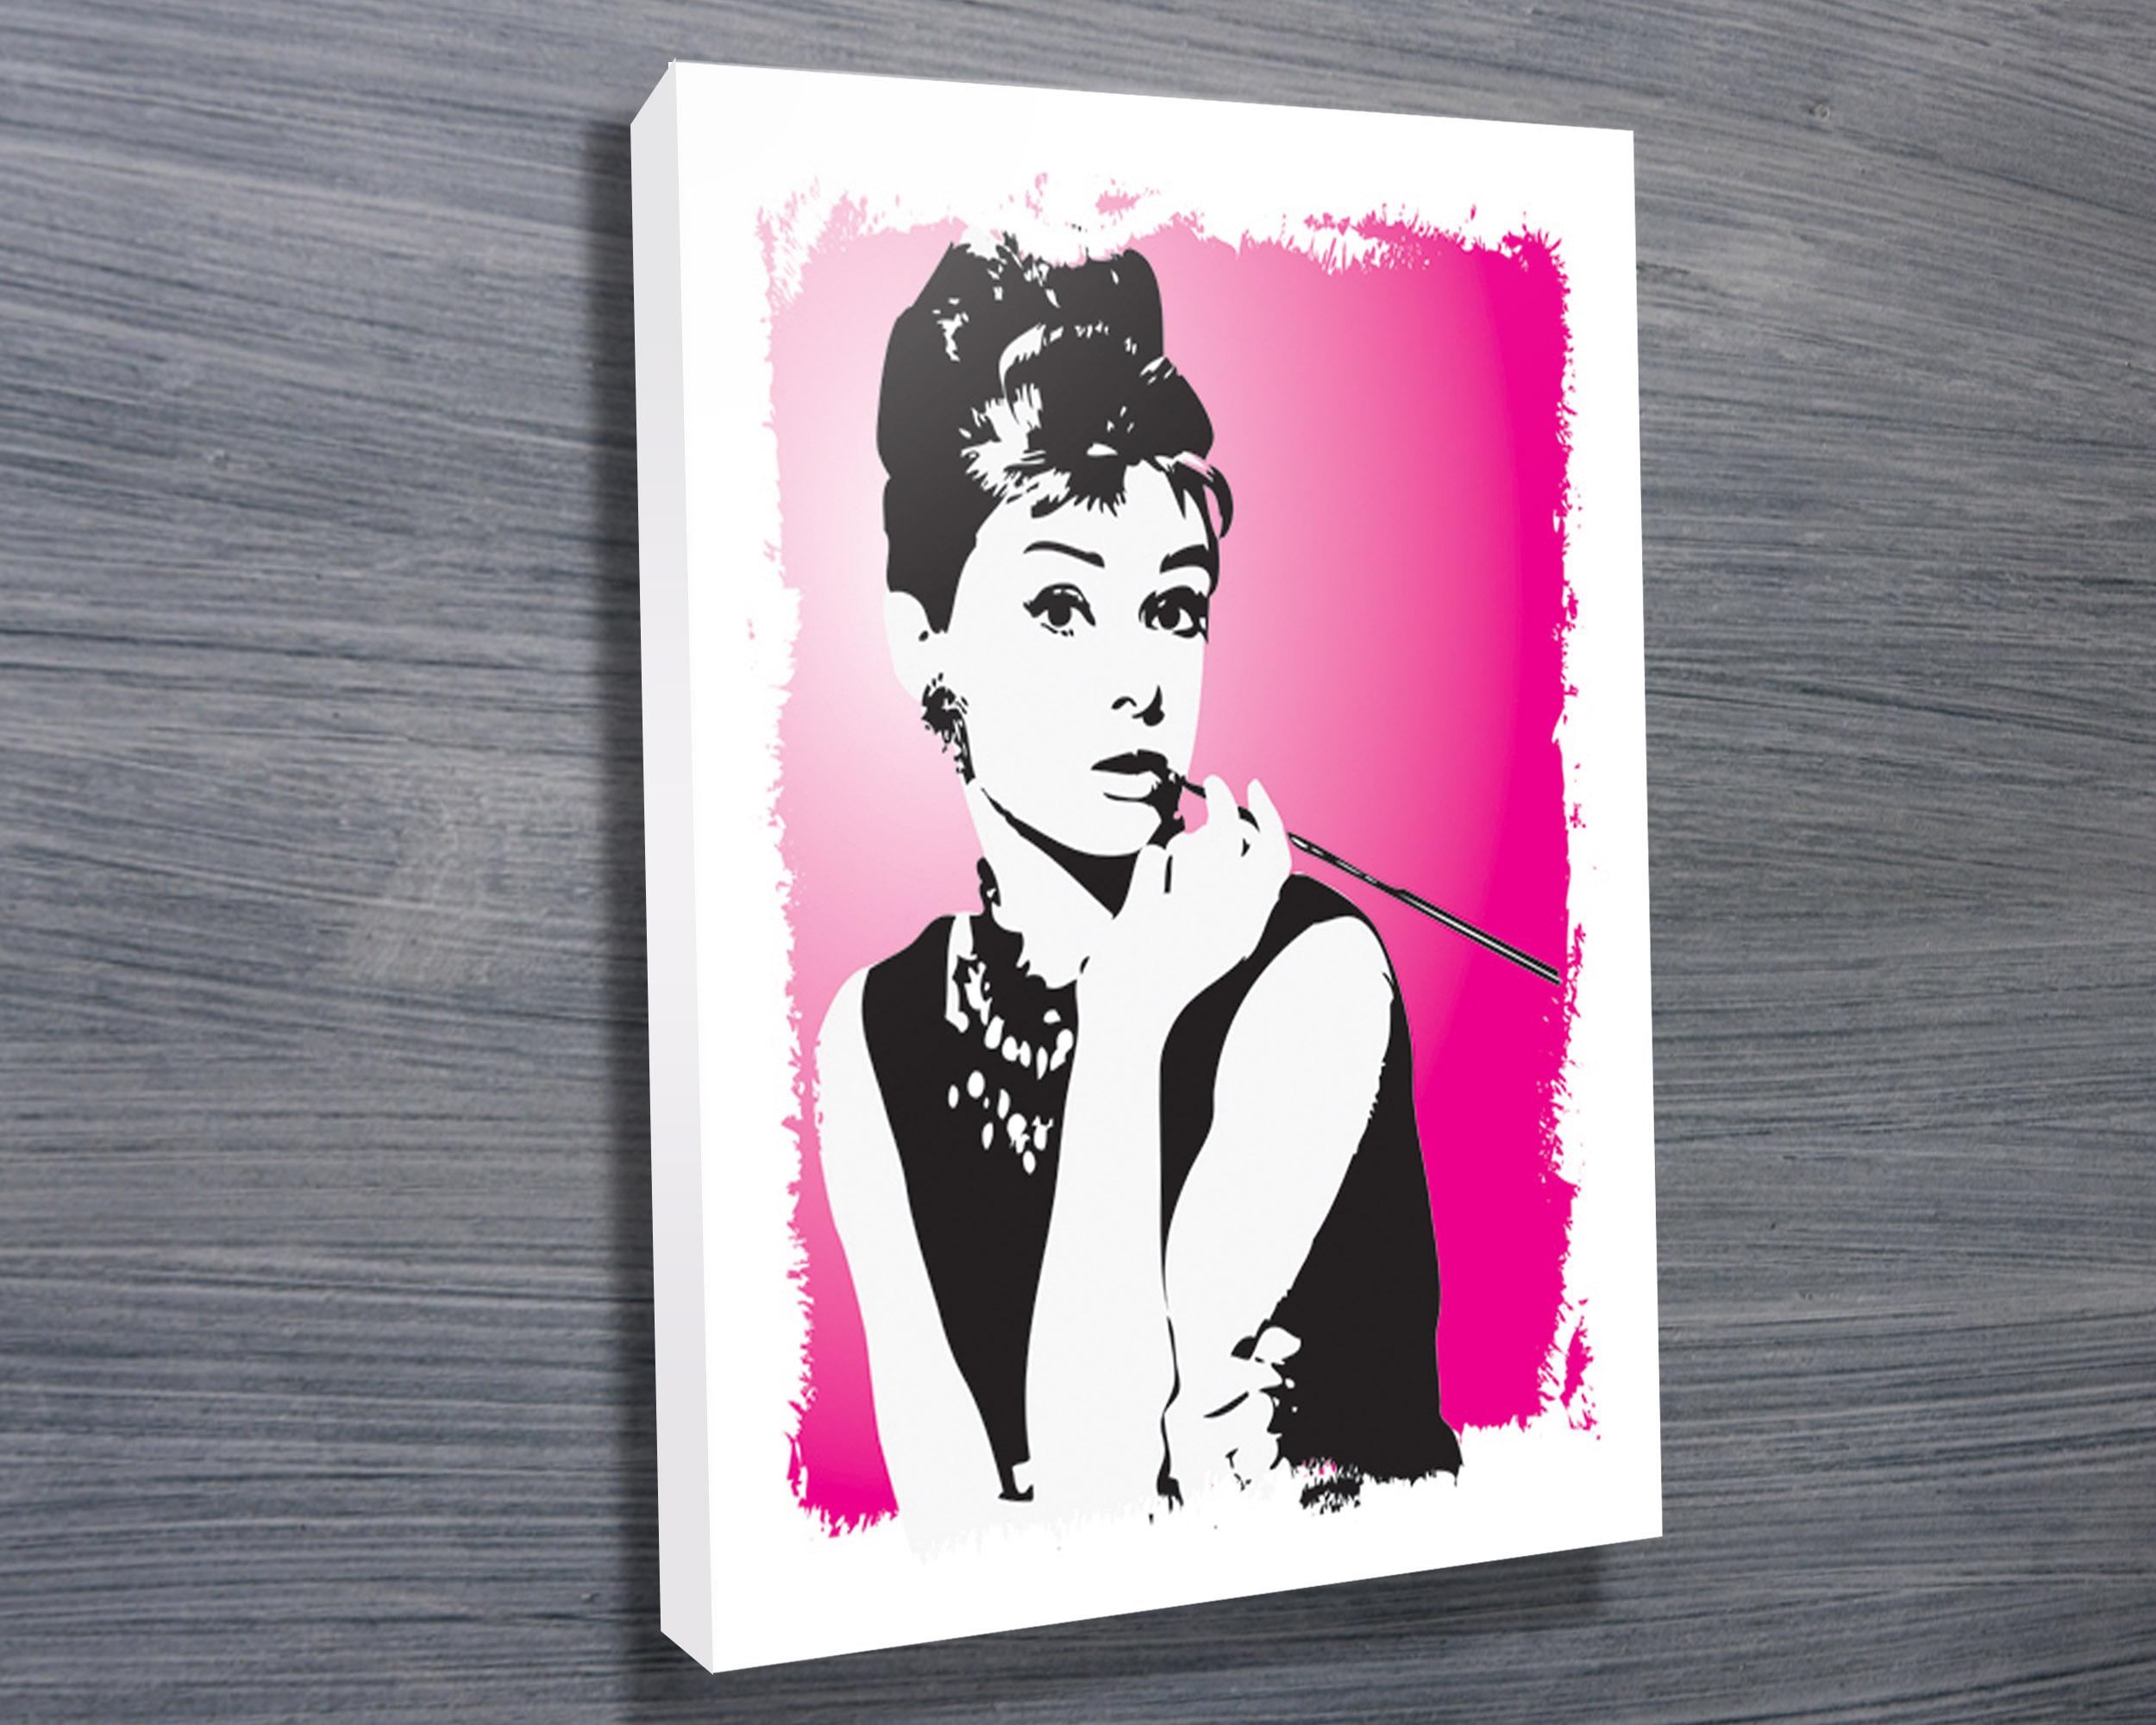 Audrey Hepburn Pink - Canvas Prints Australia